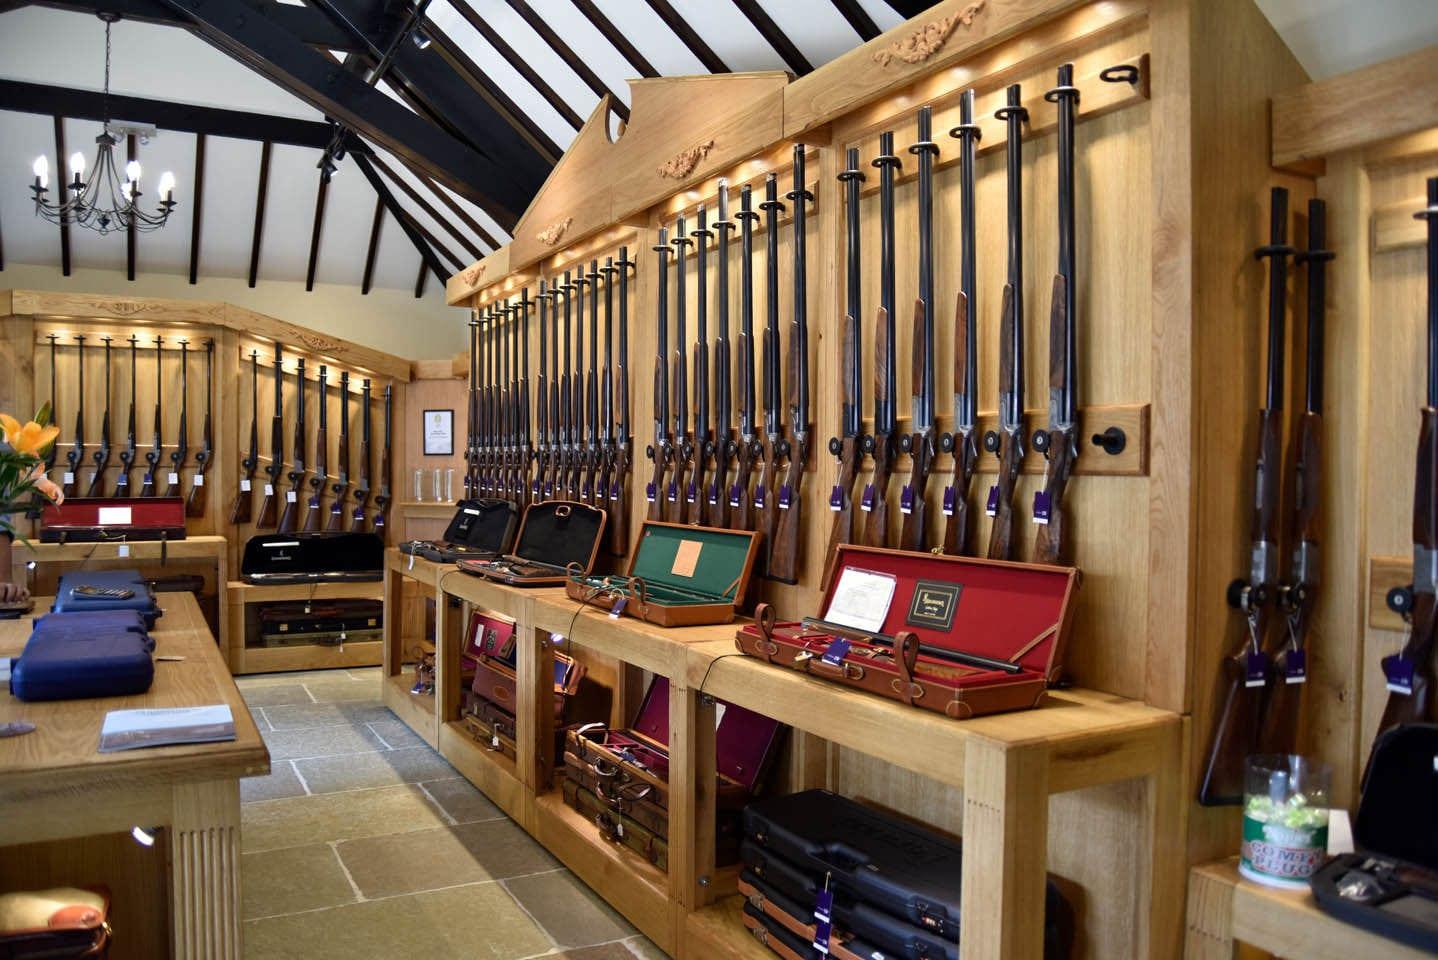 Gun rack at the Sportarm at Lady's Wood Gun Room